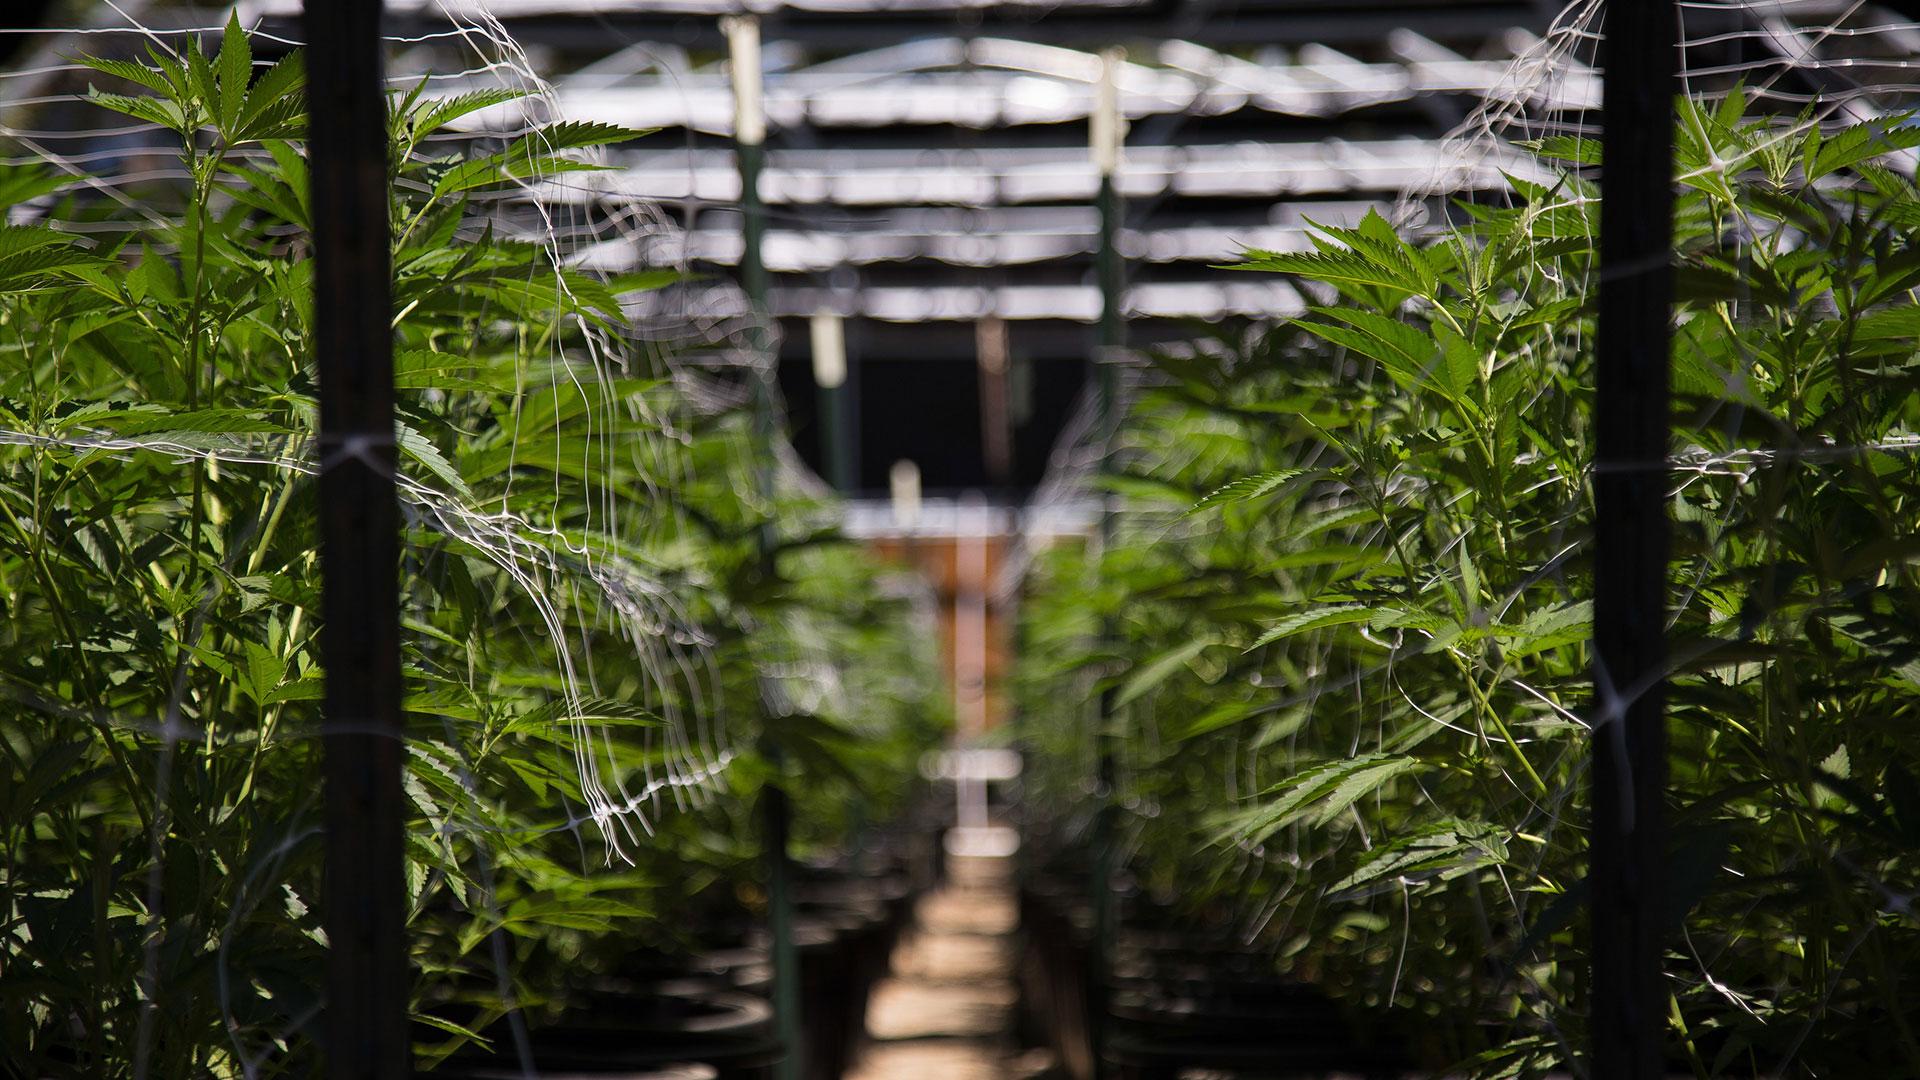 Cannabis - Marijuana plants